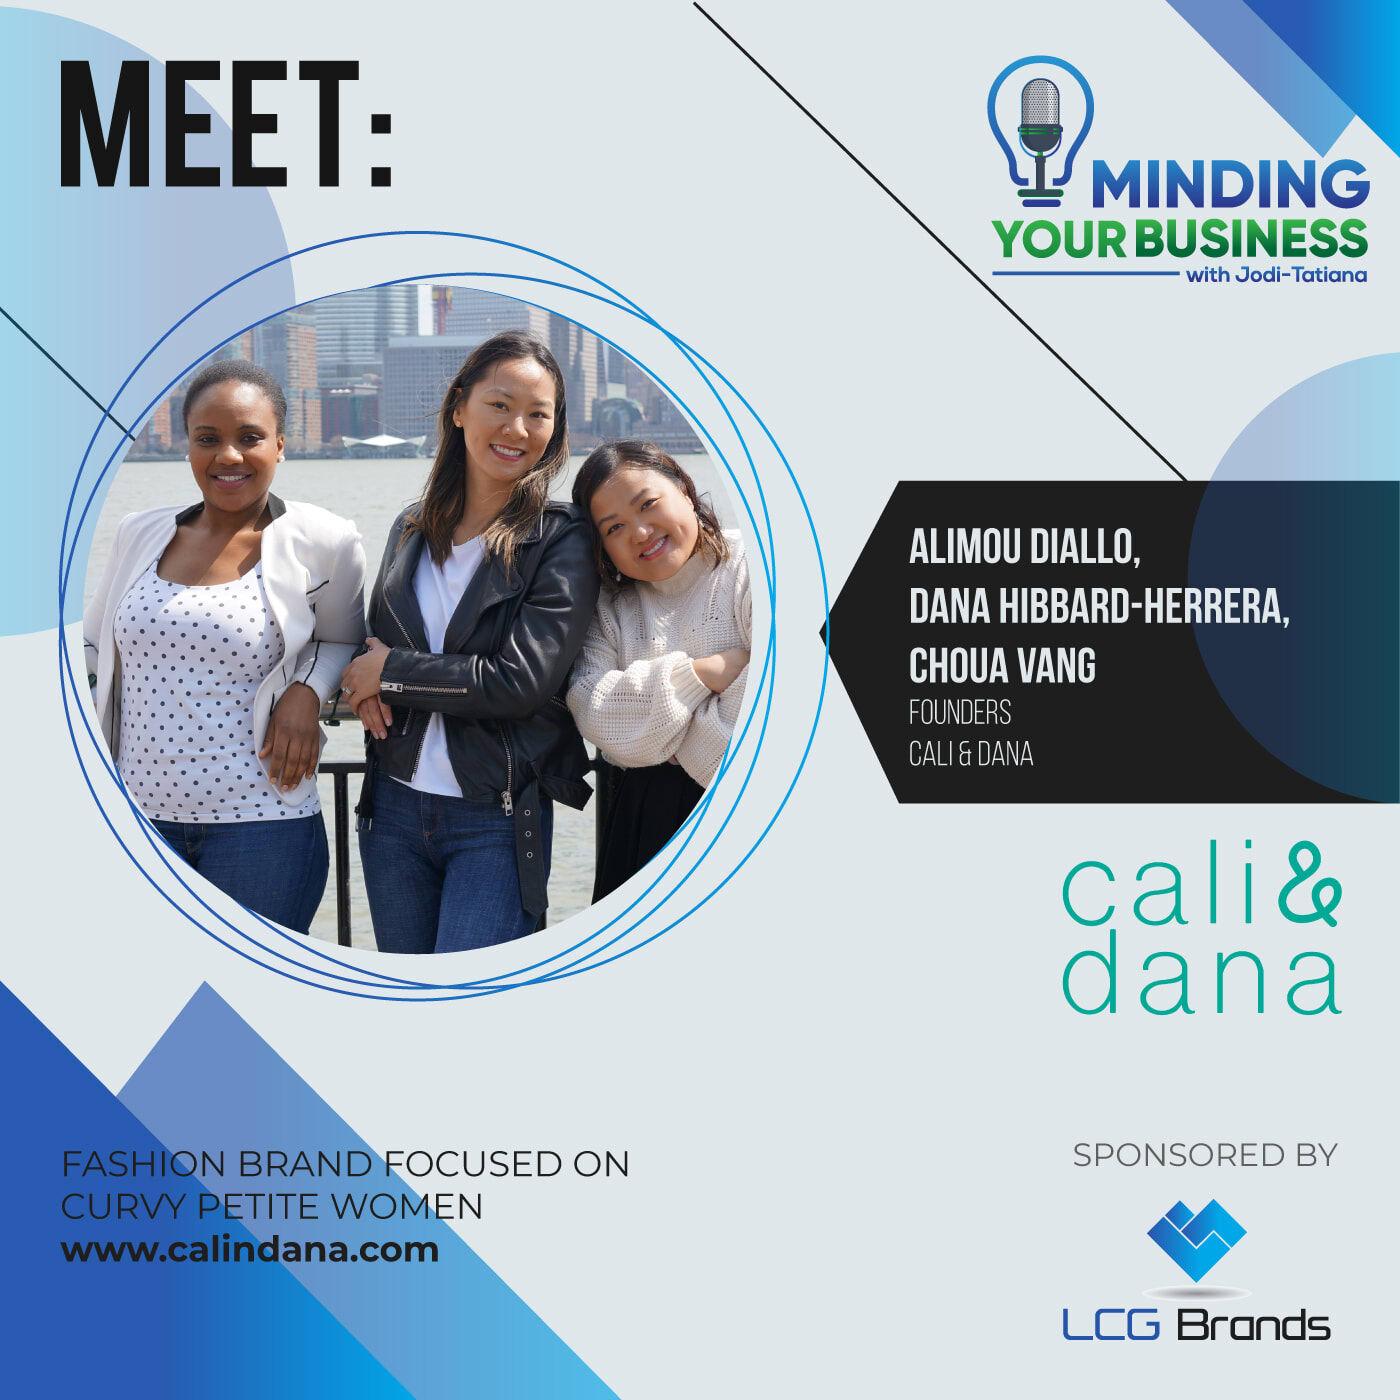 Episode 122: Meet Cali & Dana founders, Choua Vang, Alimou Diallo, Dana Hibbard-Herrera (New York & New Jersey-USA)